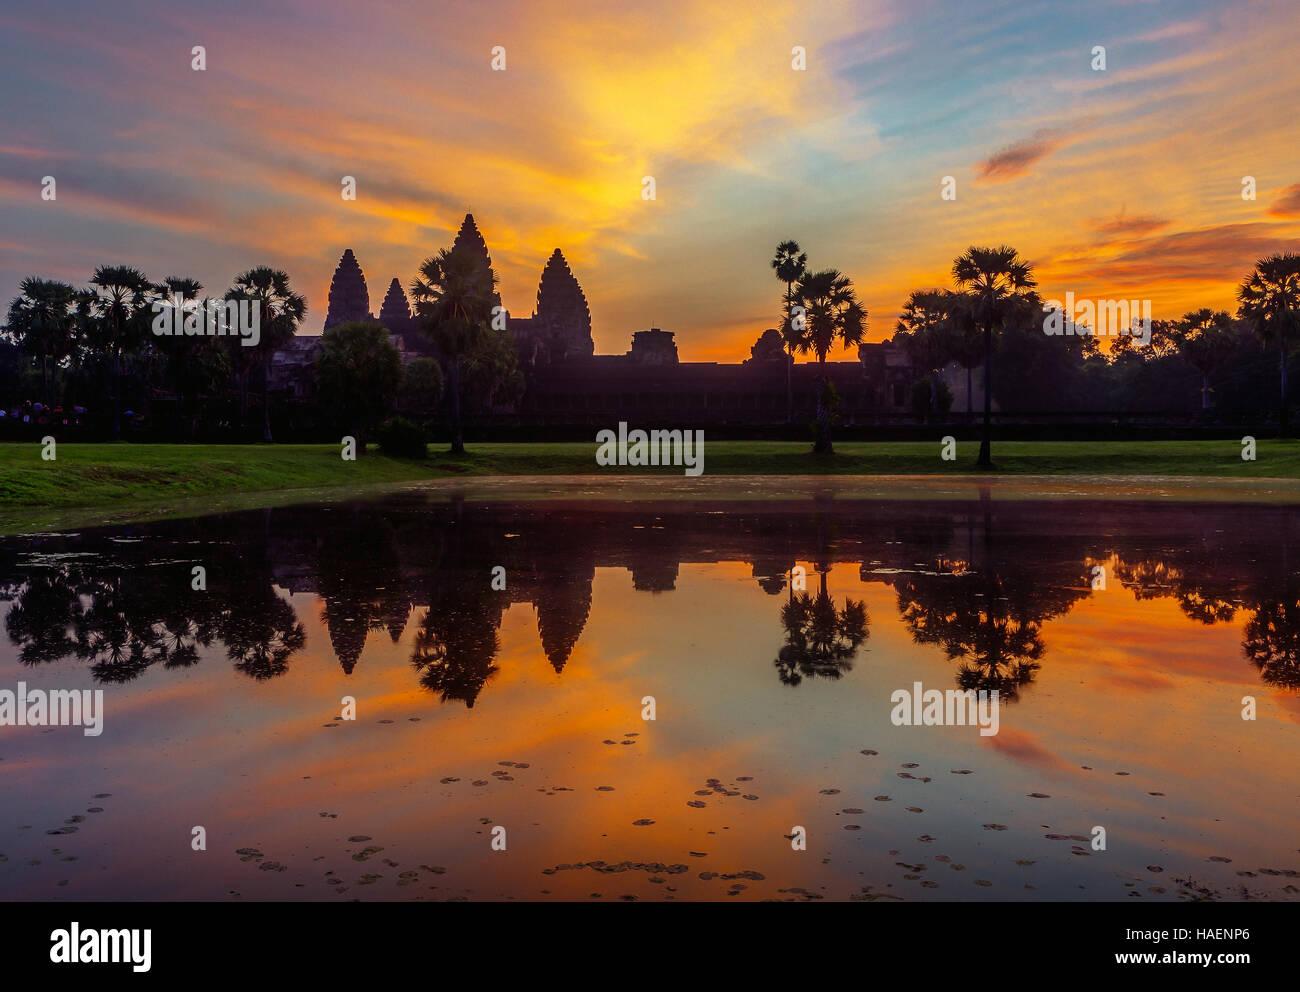 Sunrise oltre Angkor Wat, Siem Reap, Regno di Cambogia. Immagini Stock